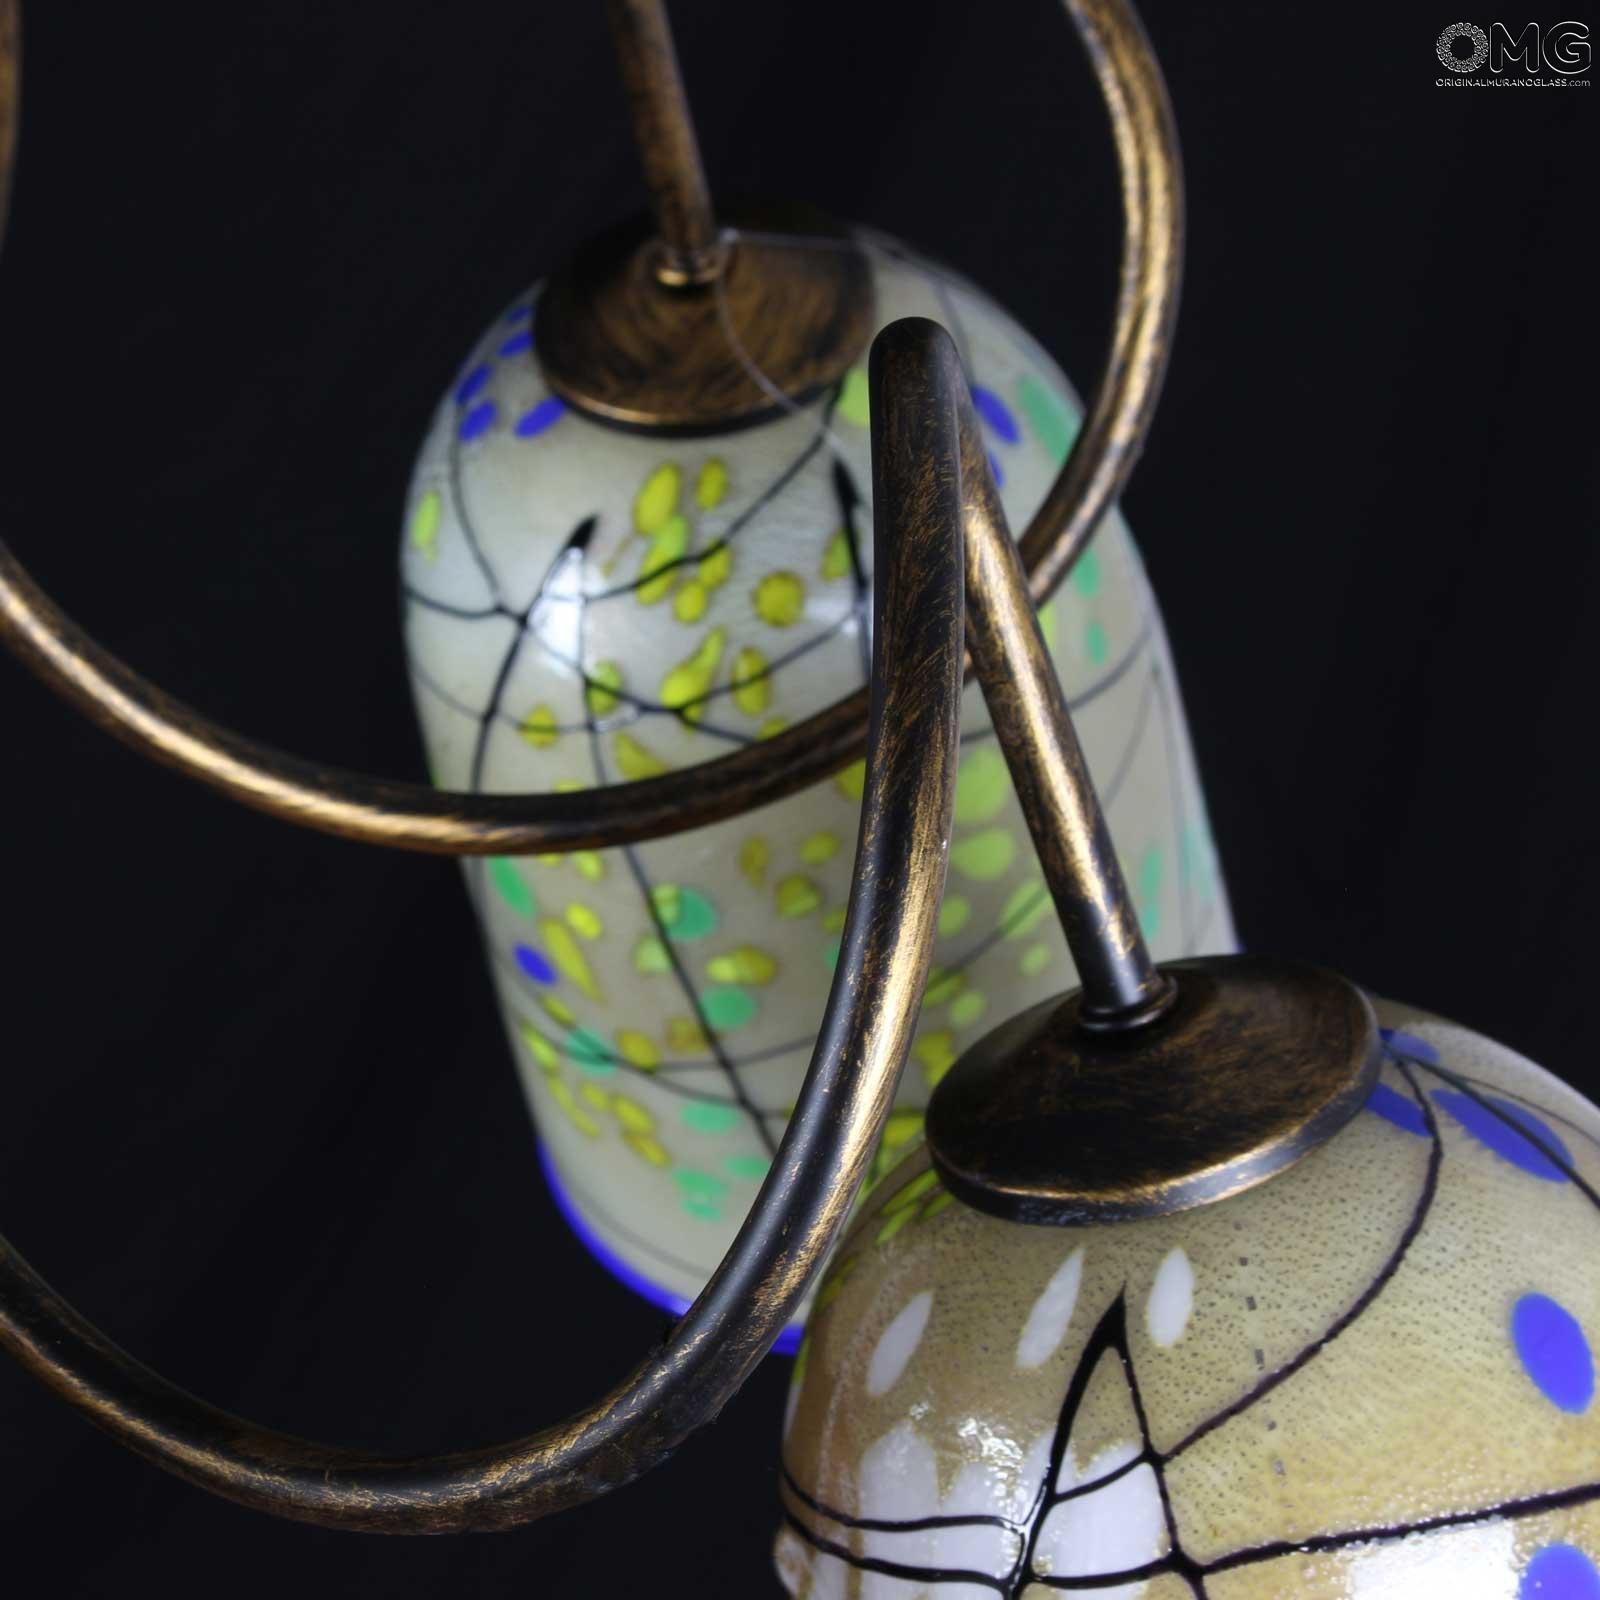 Kandinsky - Lampadario in vetro di Murano OMG - 3 luci